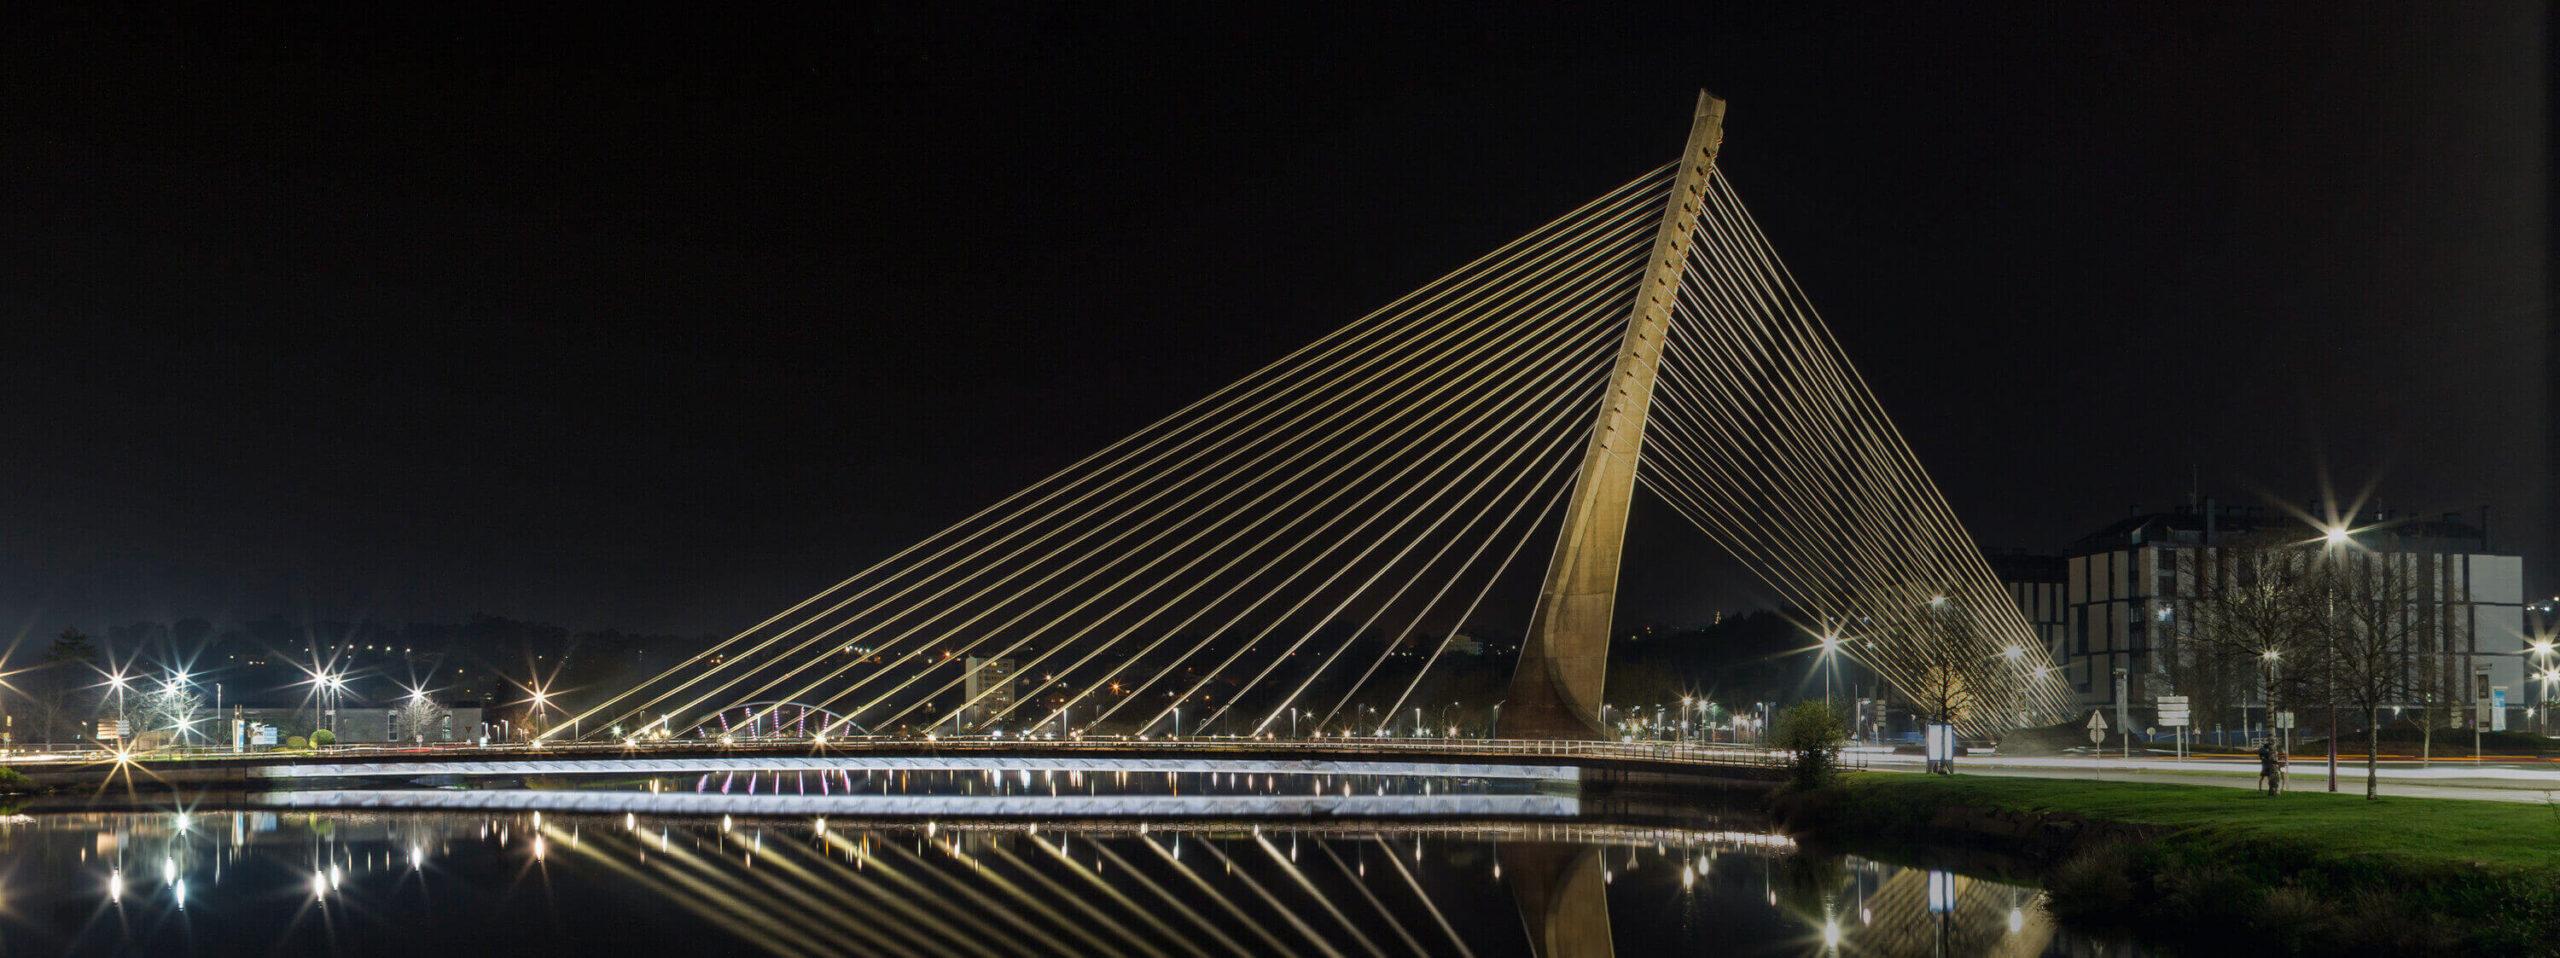 Plan Nocturno Puentes Scaled 1